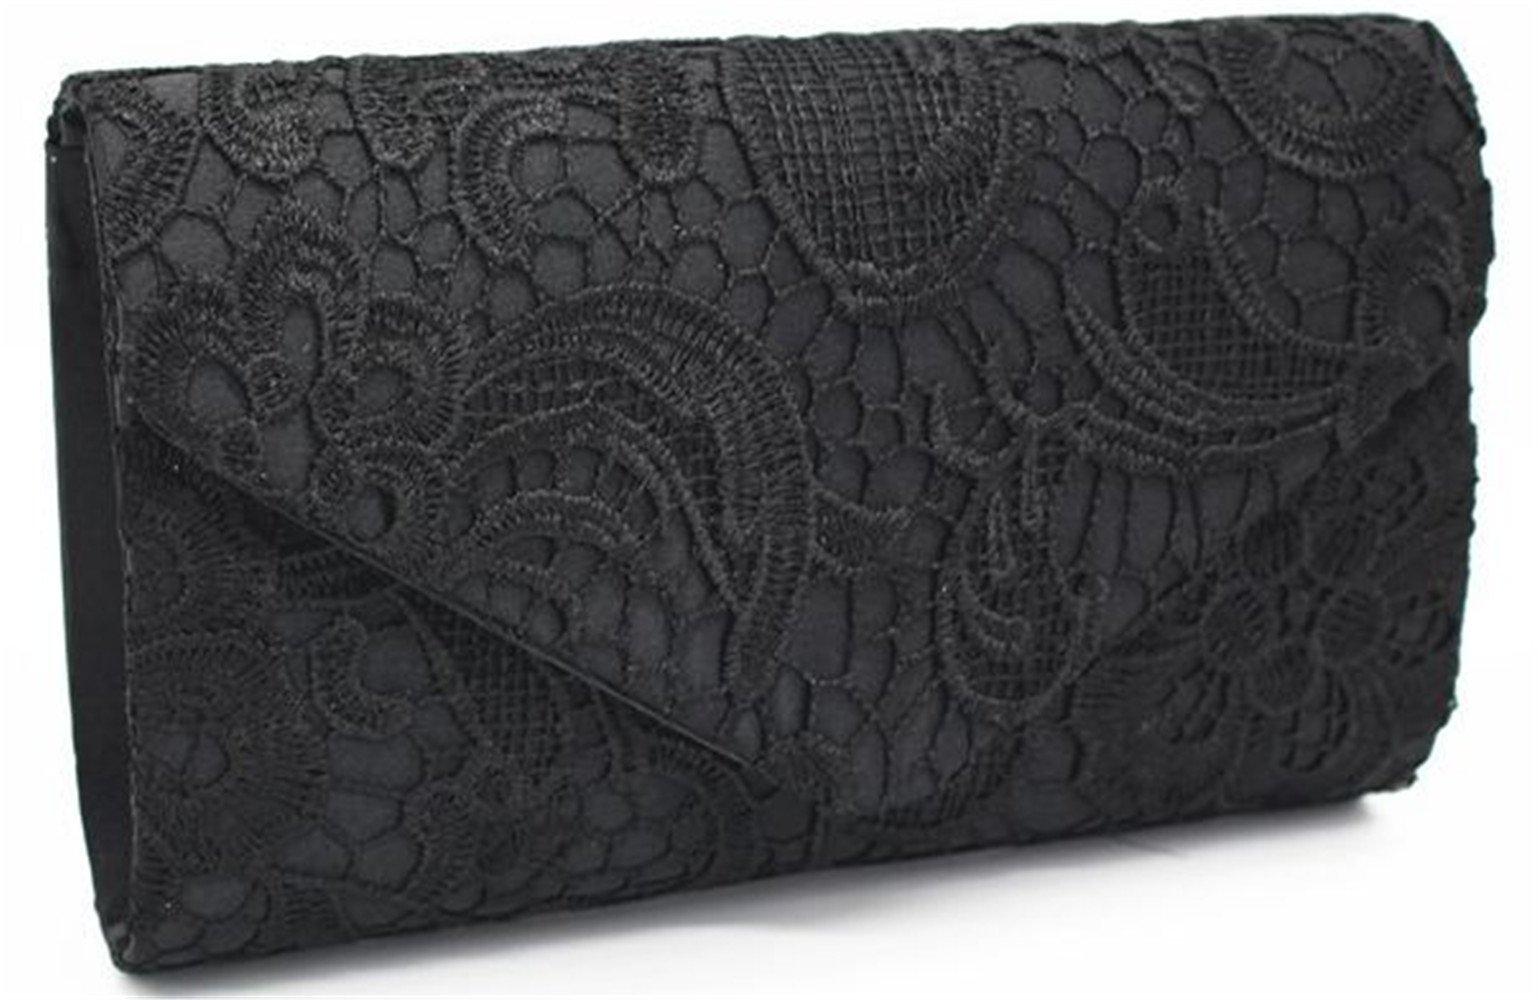 Nodykka Wedding Pleated Floral Lace Clutches Bag Evening Cross Body Handbags Purse,Black,one size